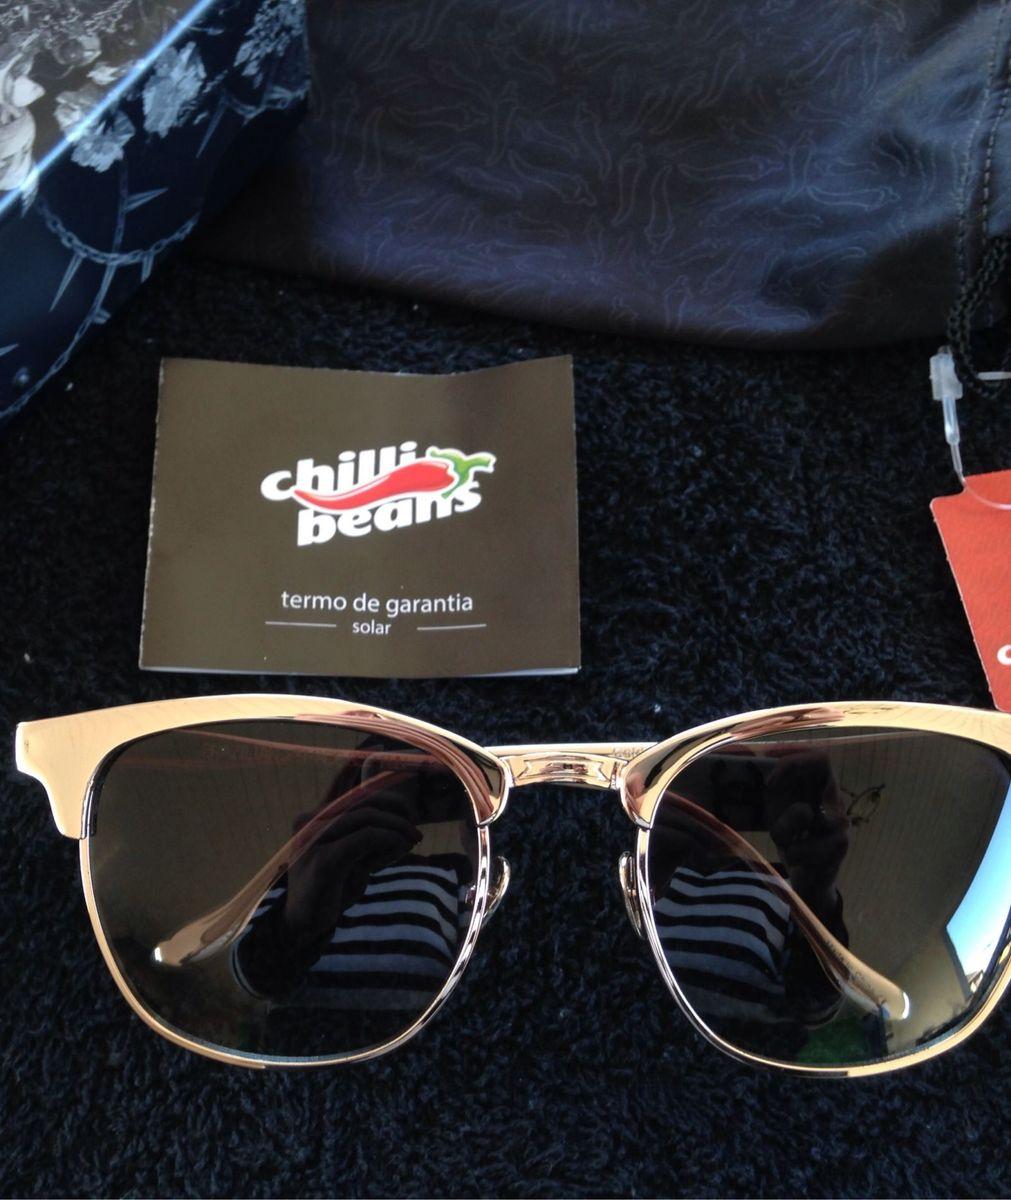 Clubmaster Banhado a Ouro 18k   Óculos Masculino Chilli Beans Usado ... 420d555846